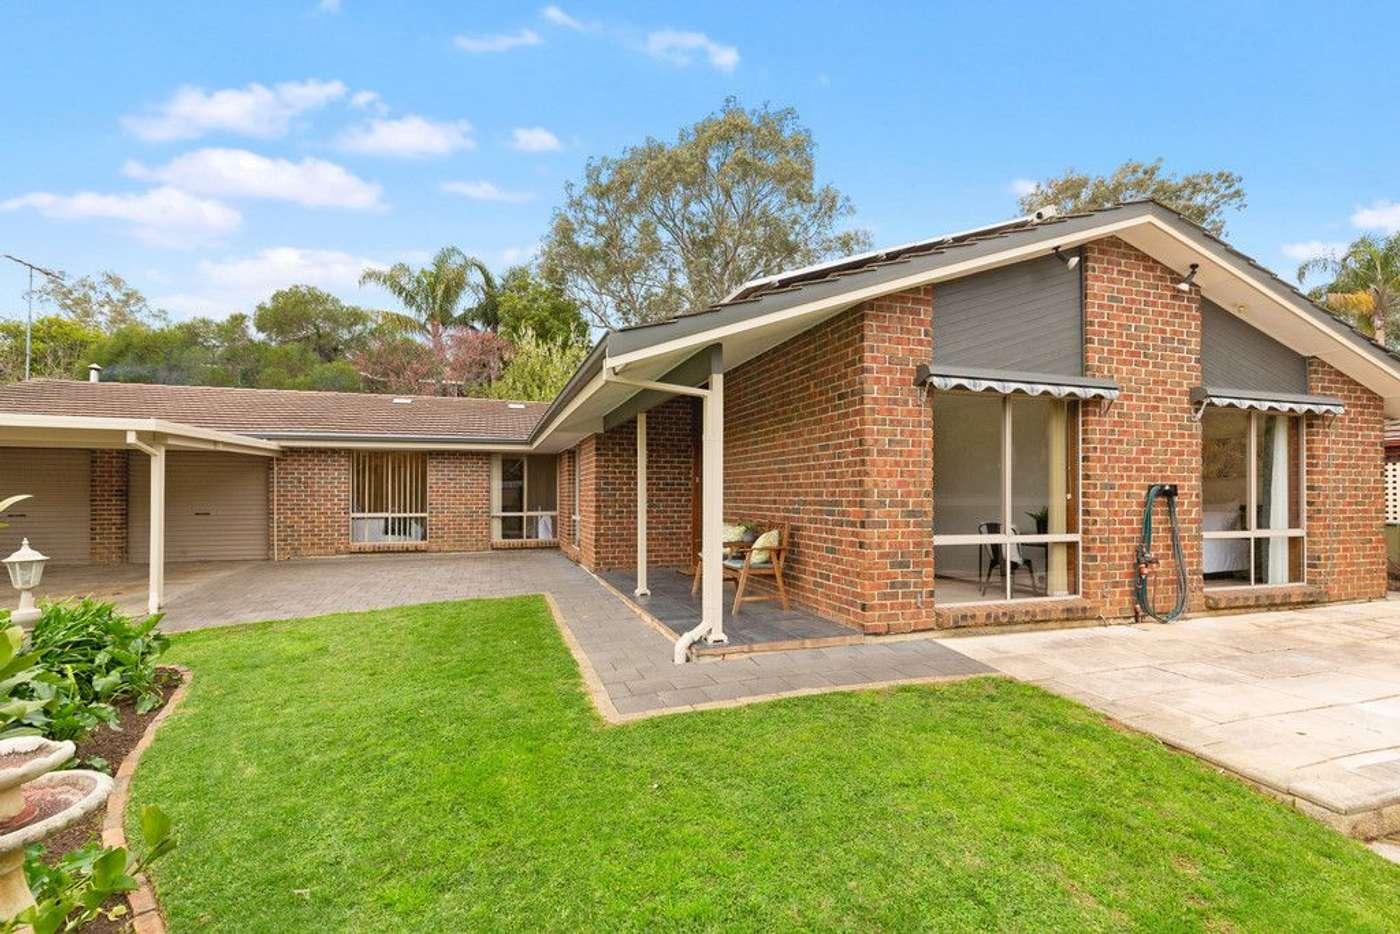 Main view of Homely house listing, 40 Horseshoe Drive, Aberfoyle Park SA 5159